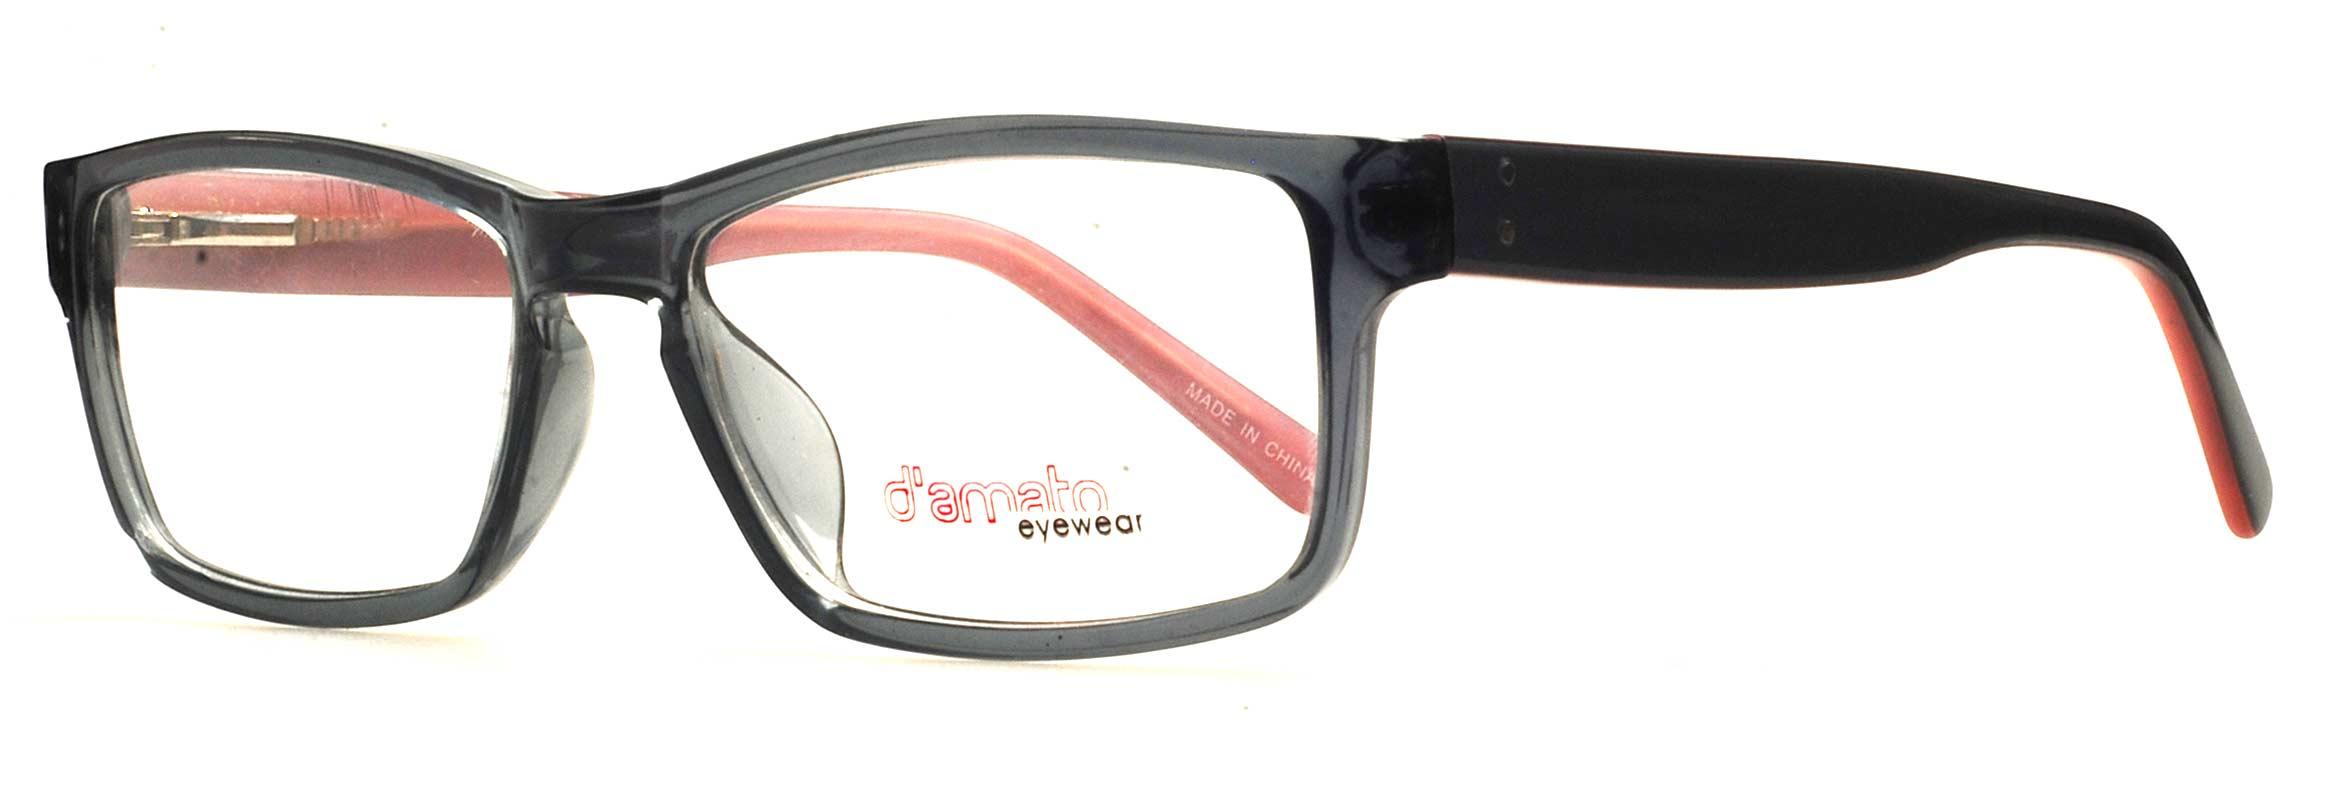 dz181 55 17 140 cry b new trends eyewear